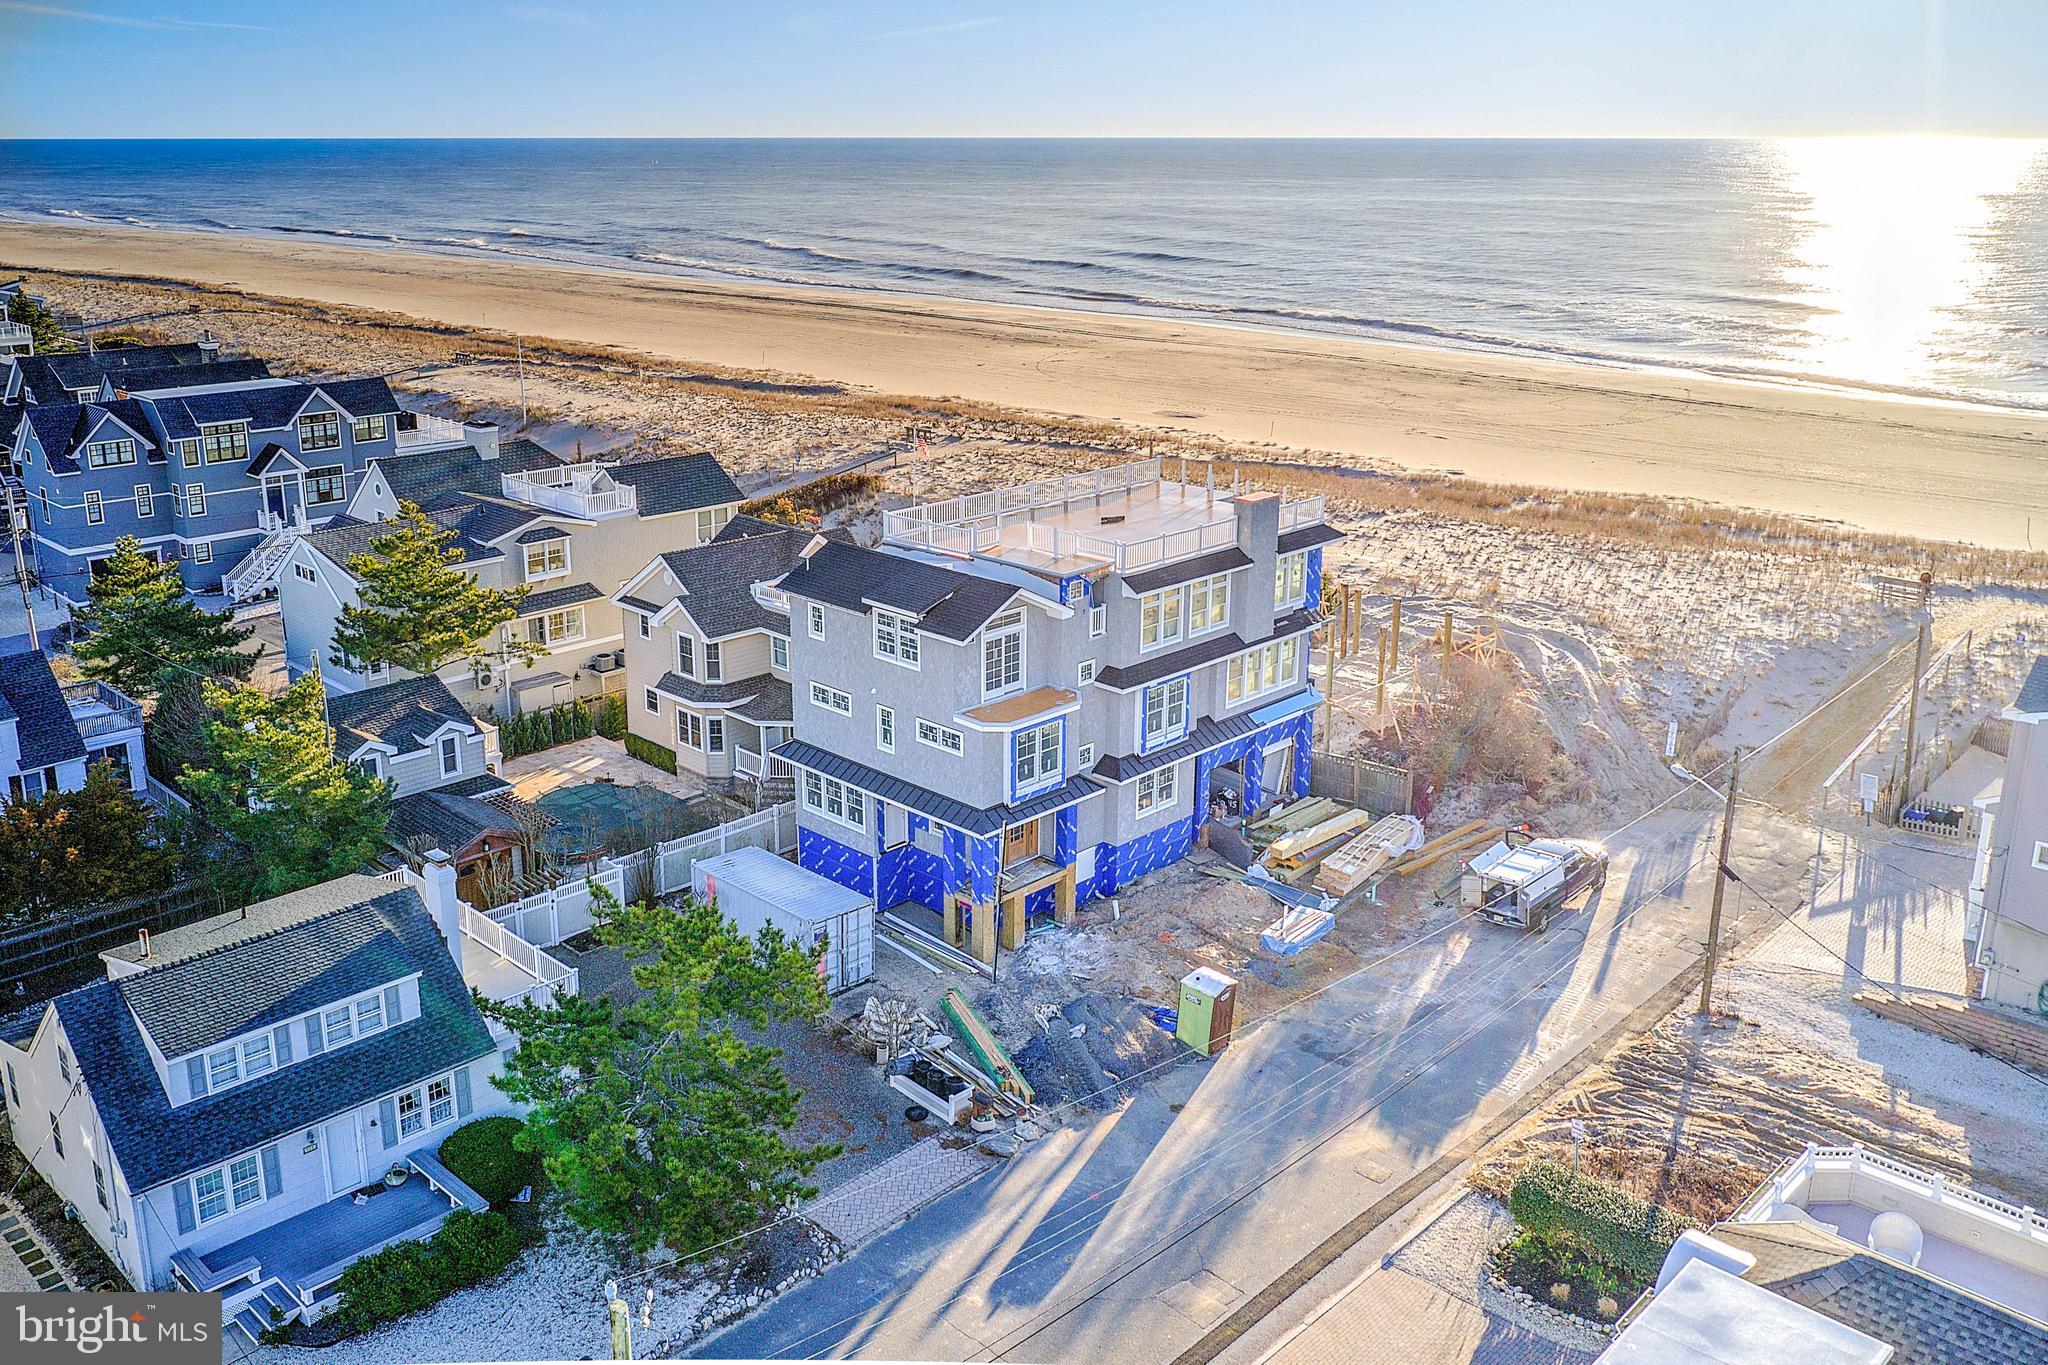 123 E TEXAS AVENUE, LONG BEACH TOWNSHIP, NJ 08008